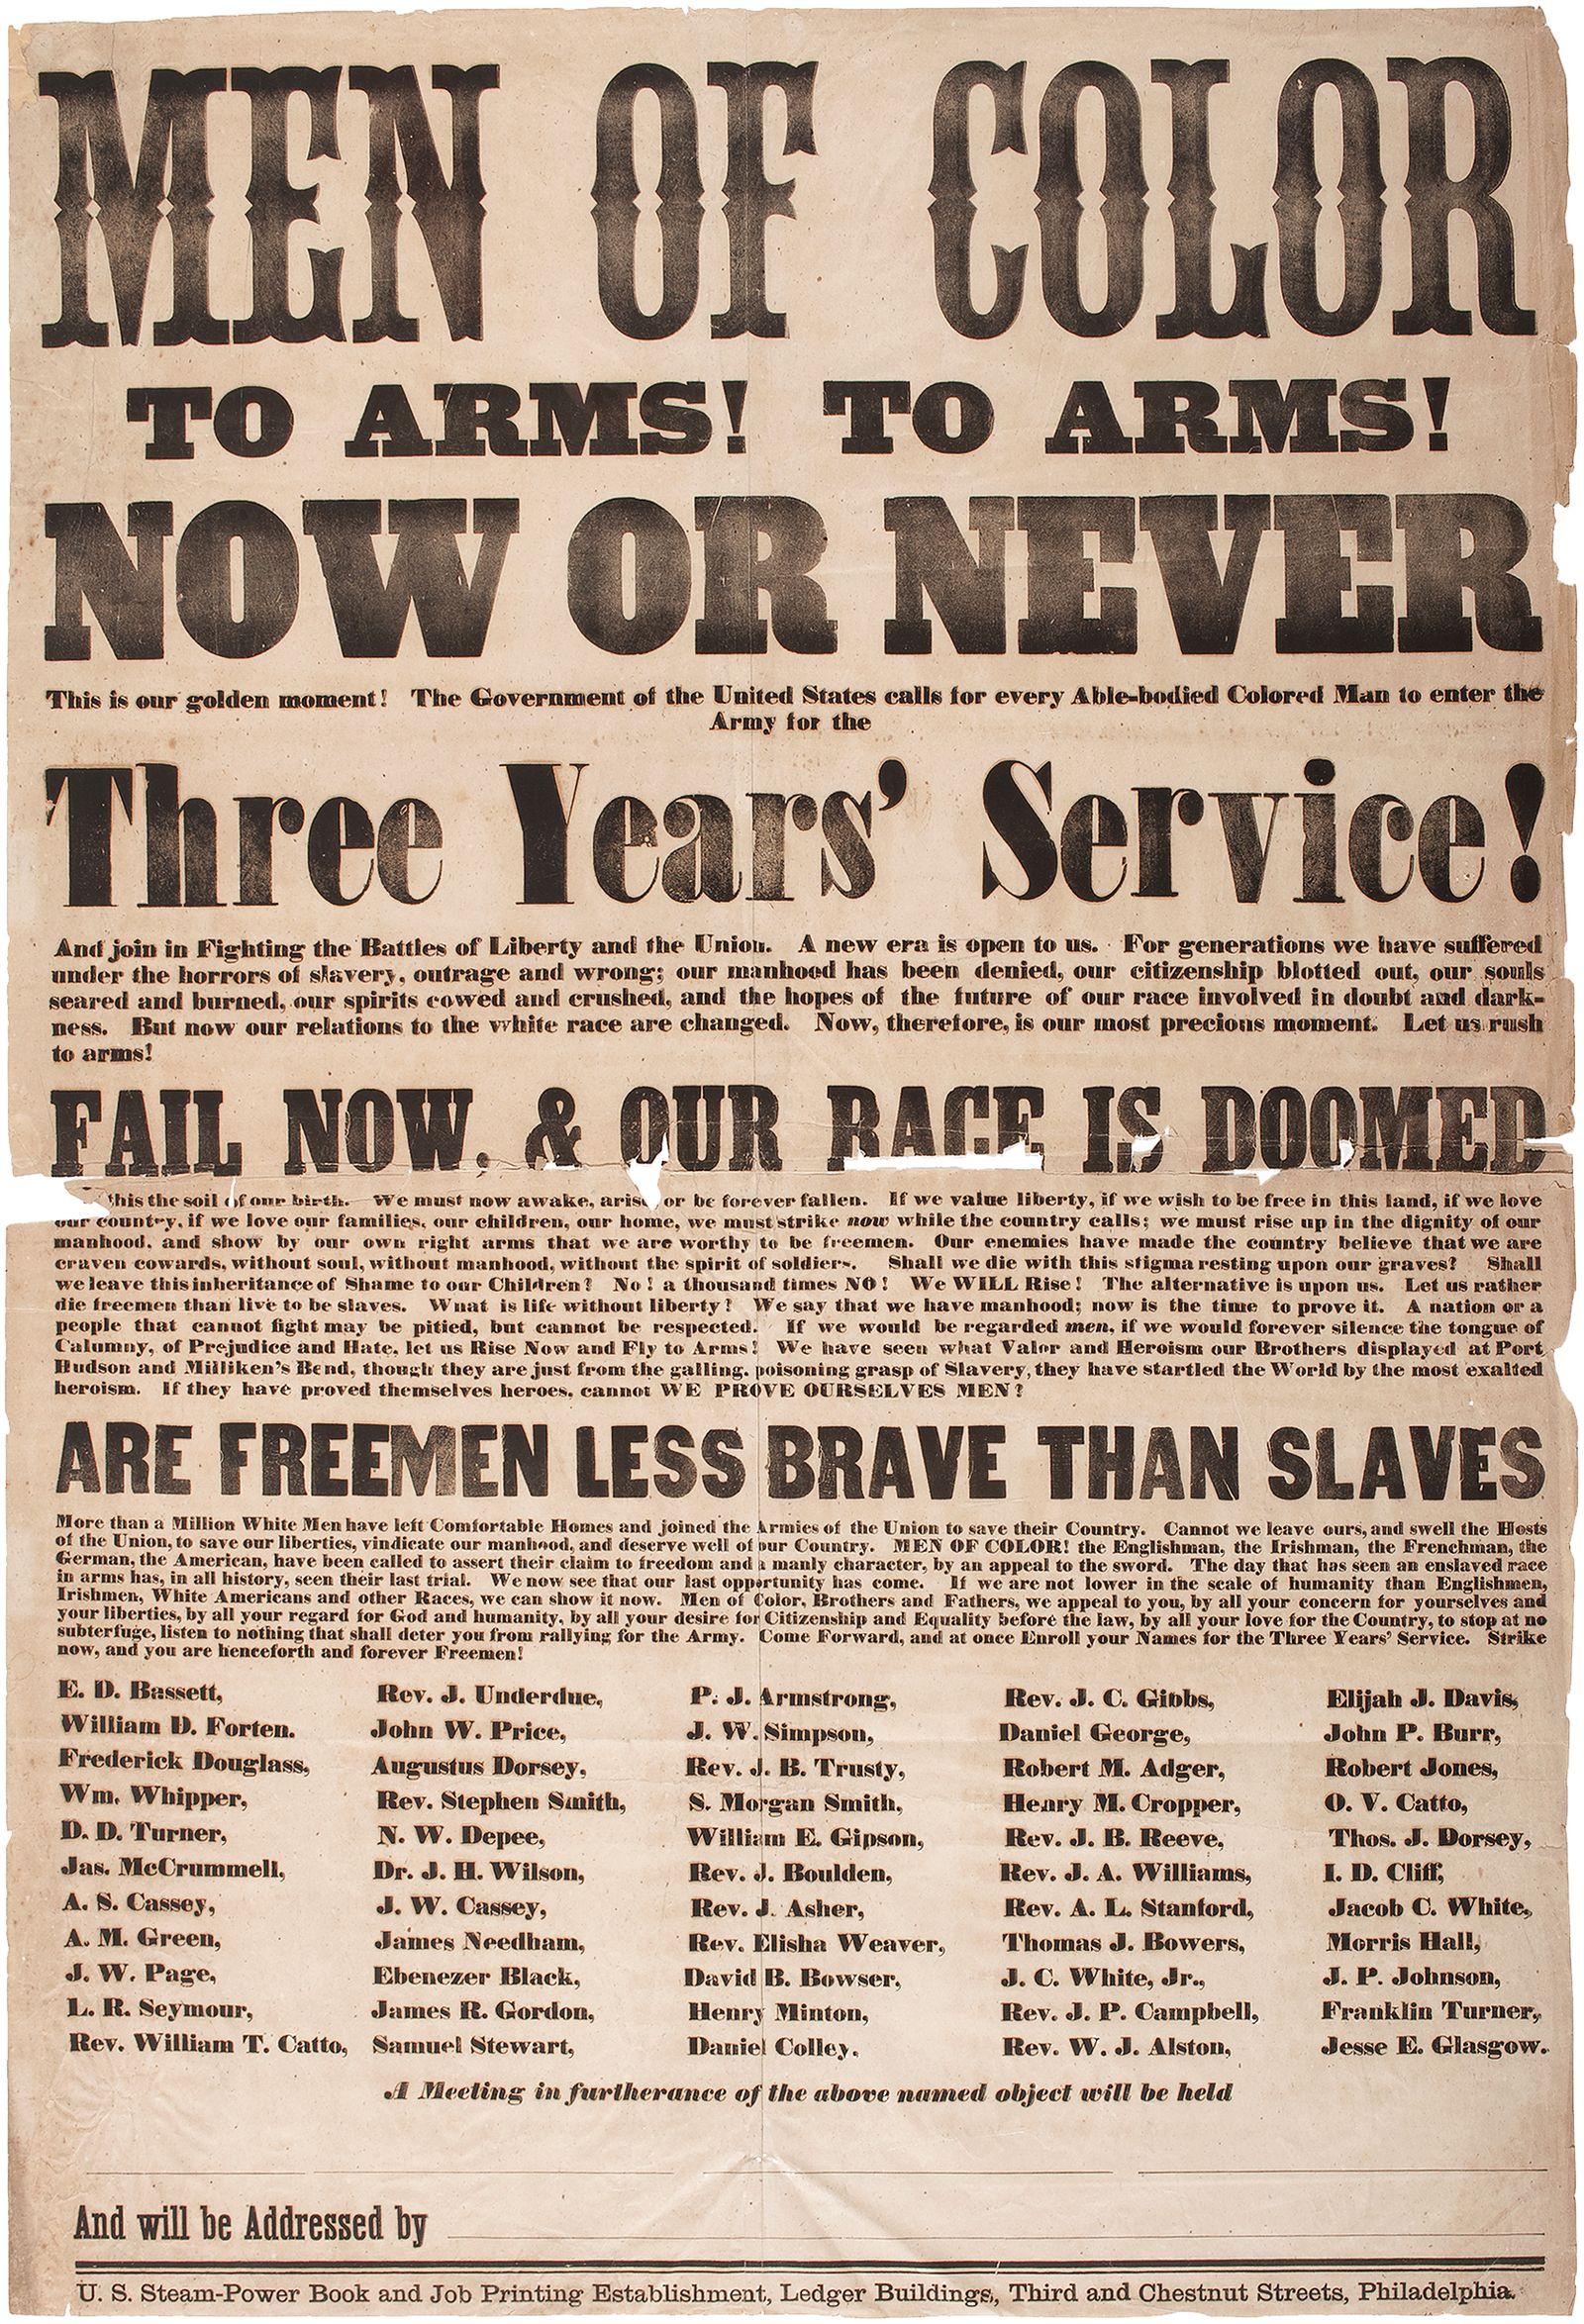 Men_of_Color_Civil_War_Recruitment_Broadside_1863